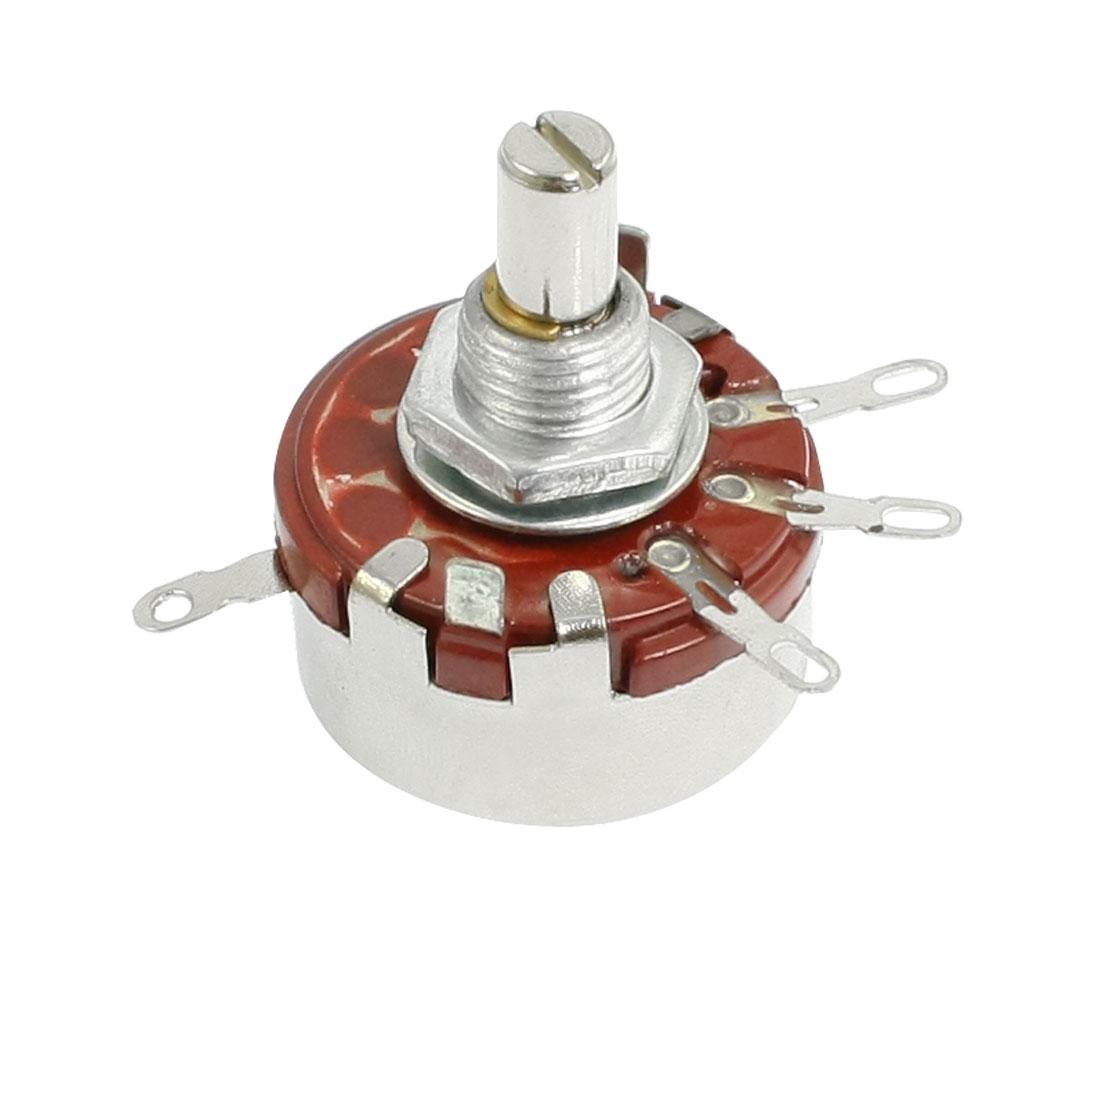 2W 2.2K ohm 6mm Shaft Diameter Single Linear Taper Rotary Potentiometer